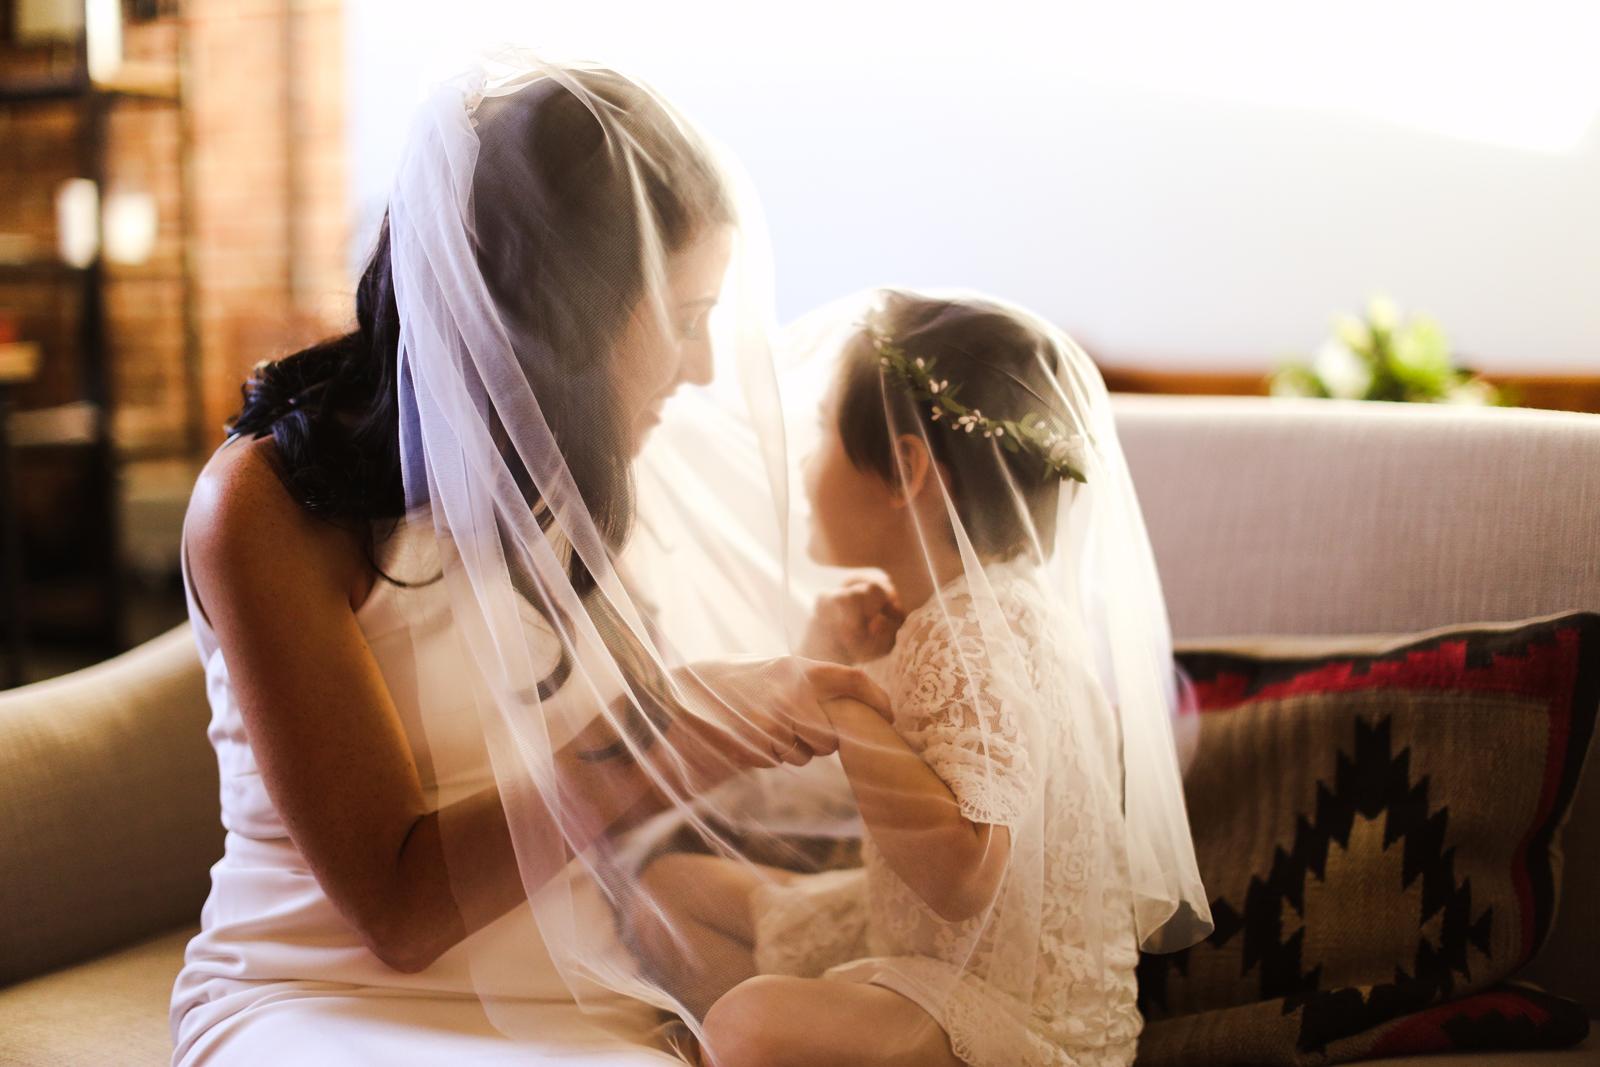 colleen-and-joes-wedding-day-385.jpg